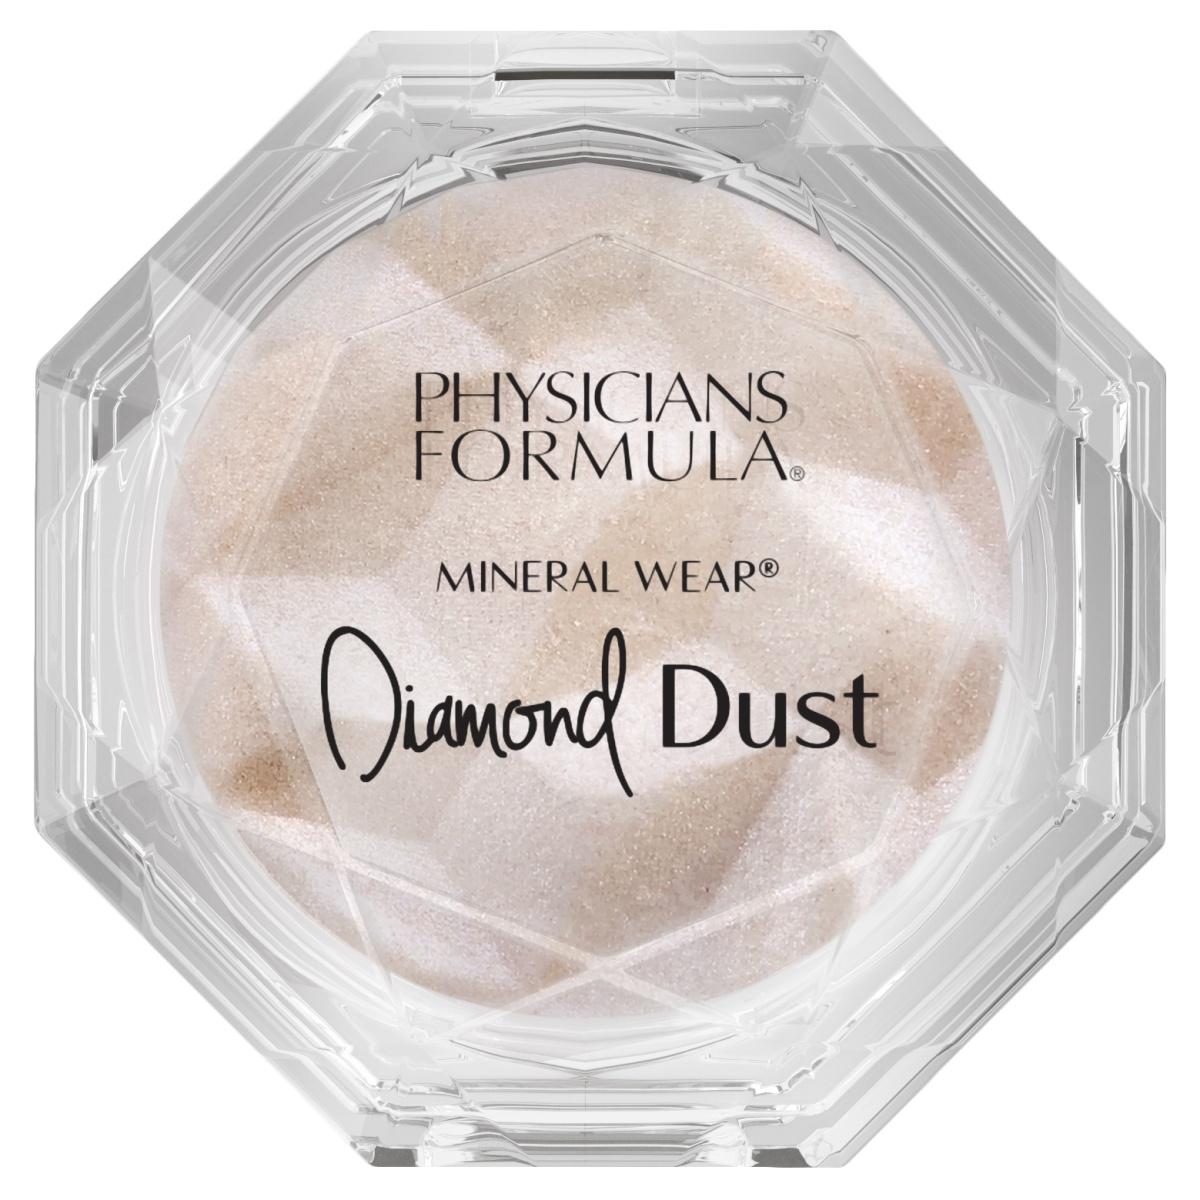 Physicians Formula Mineral Wear® Diamond Dust - Starlit Glow